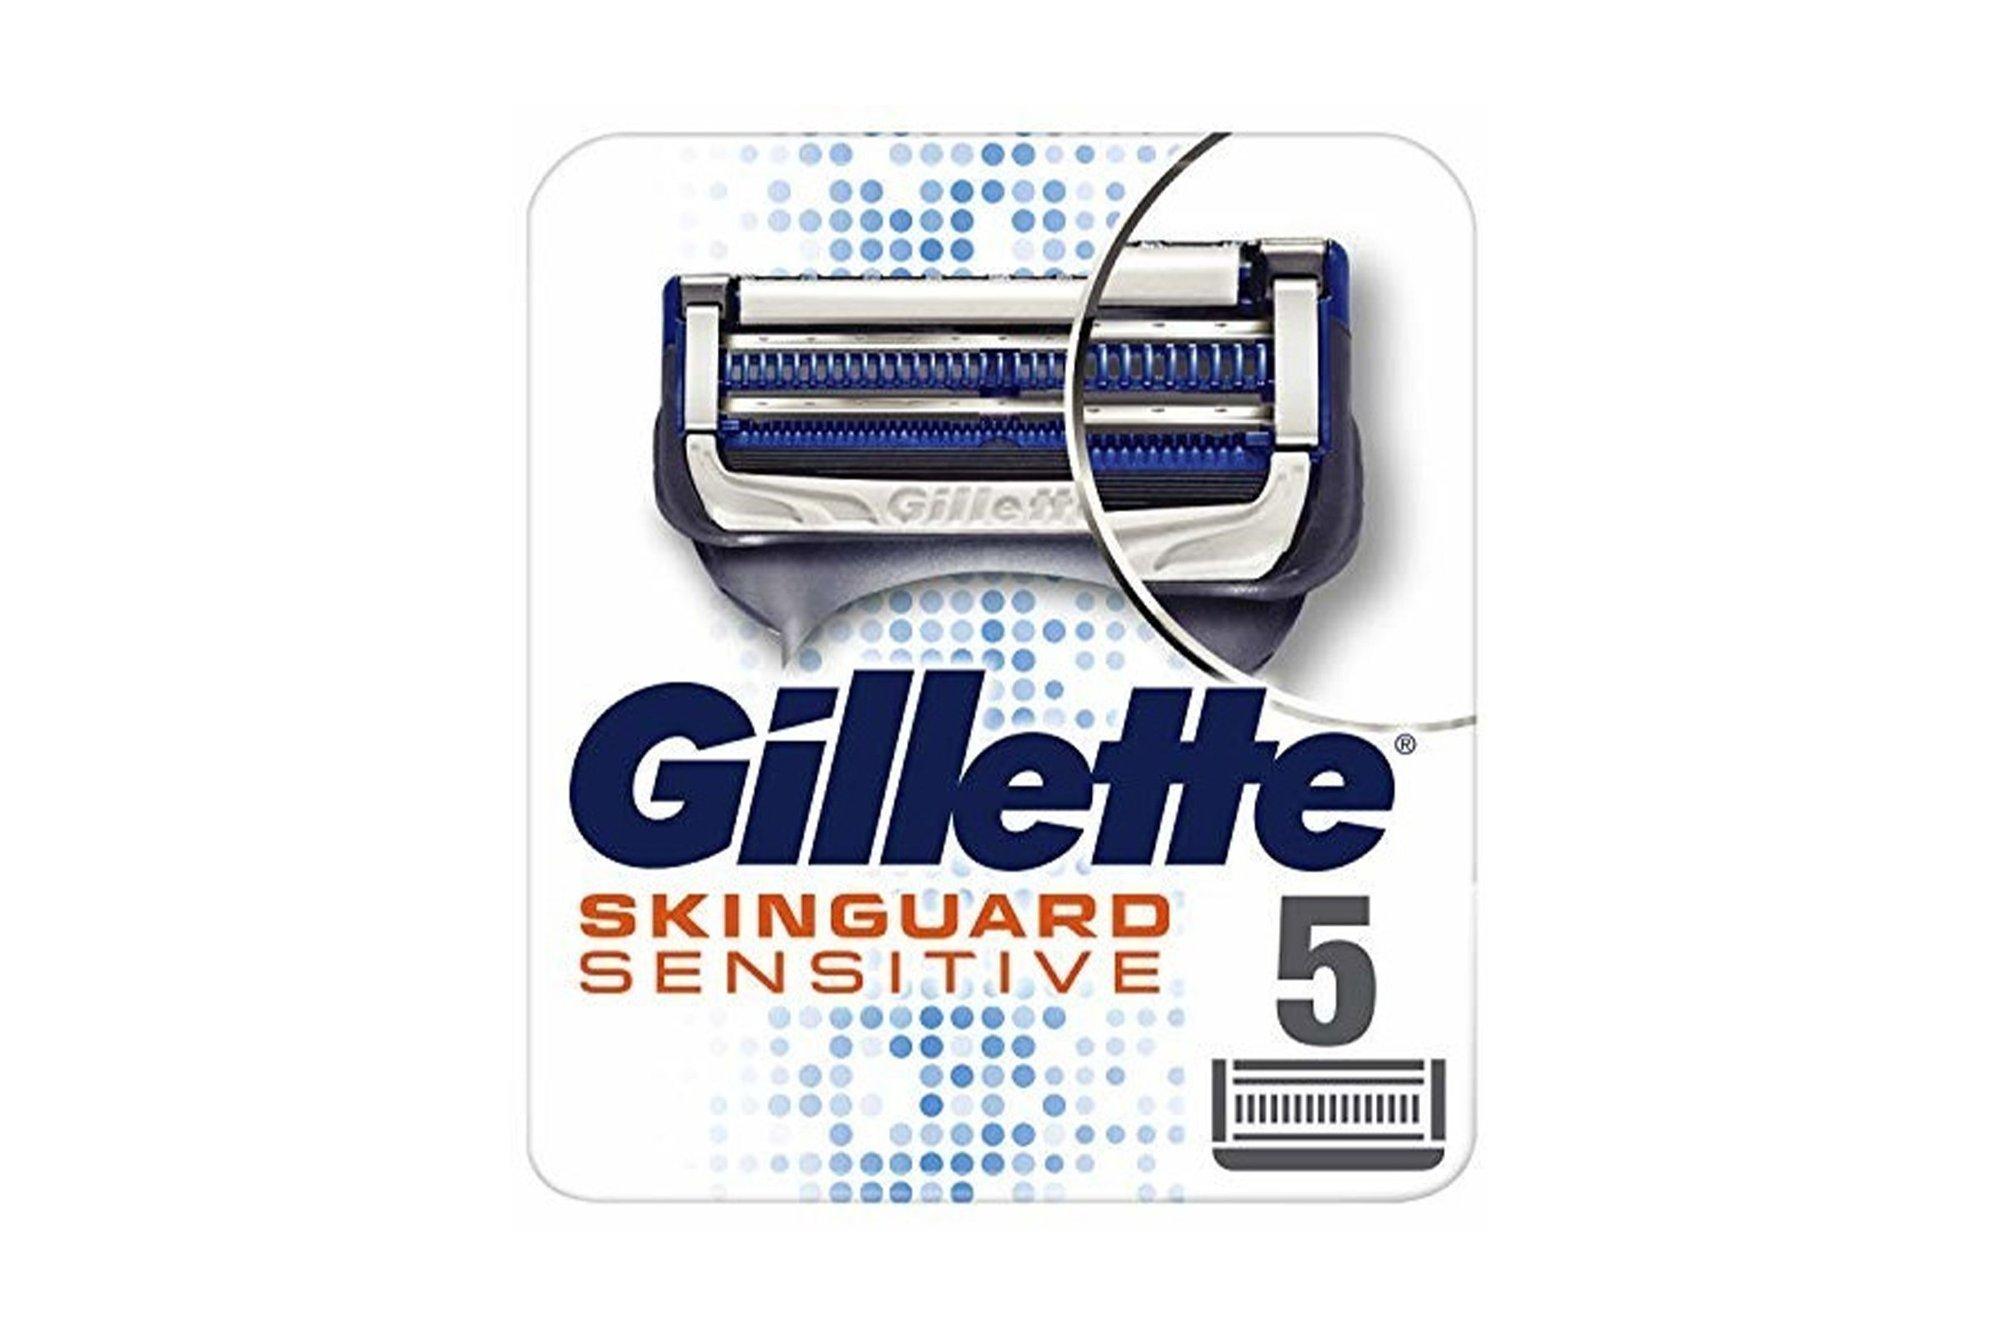 5x Original replacement blades Gillette Skinguard Sensitive